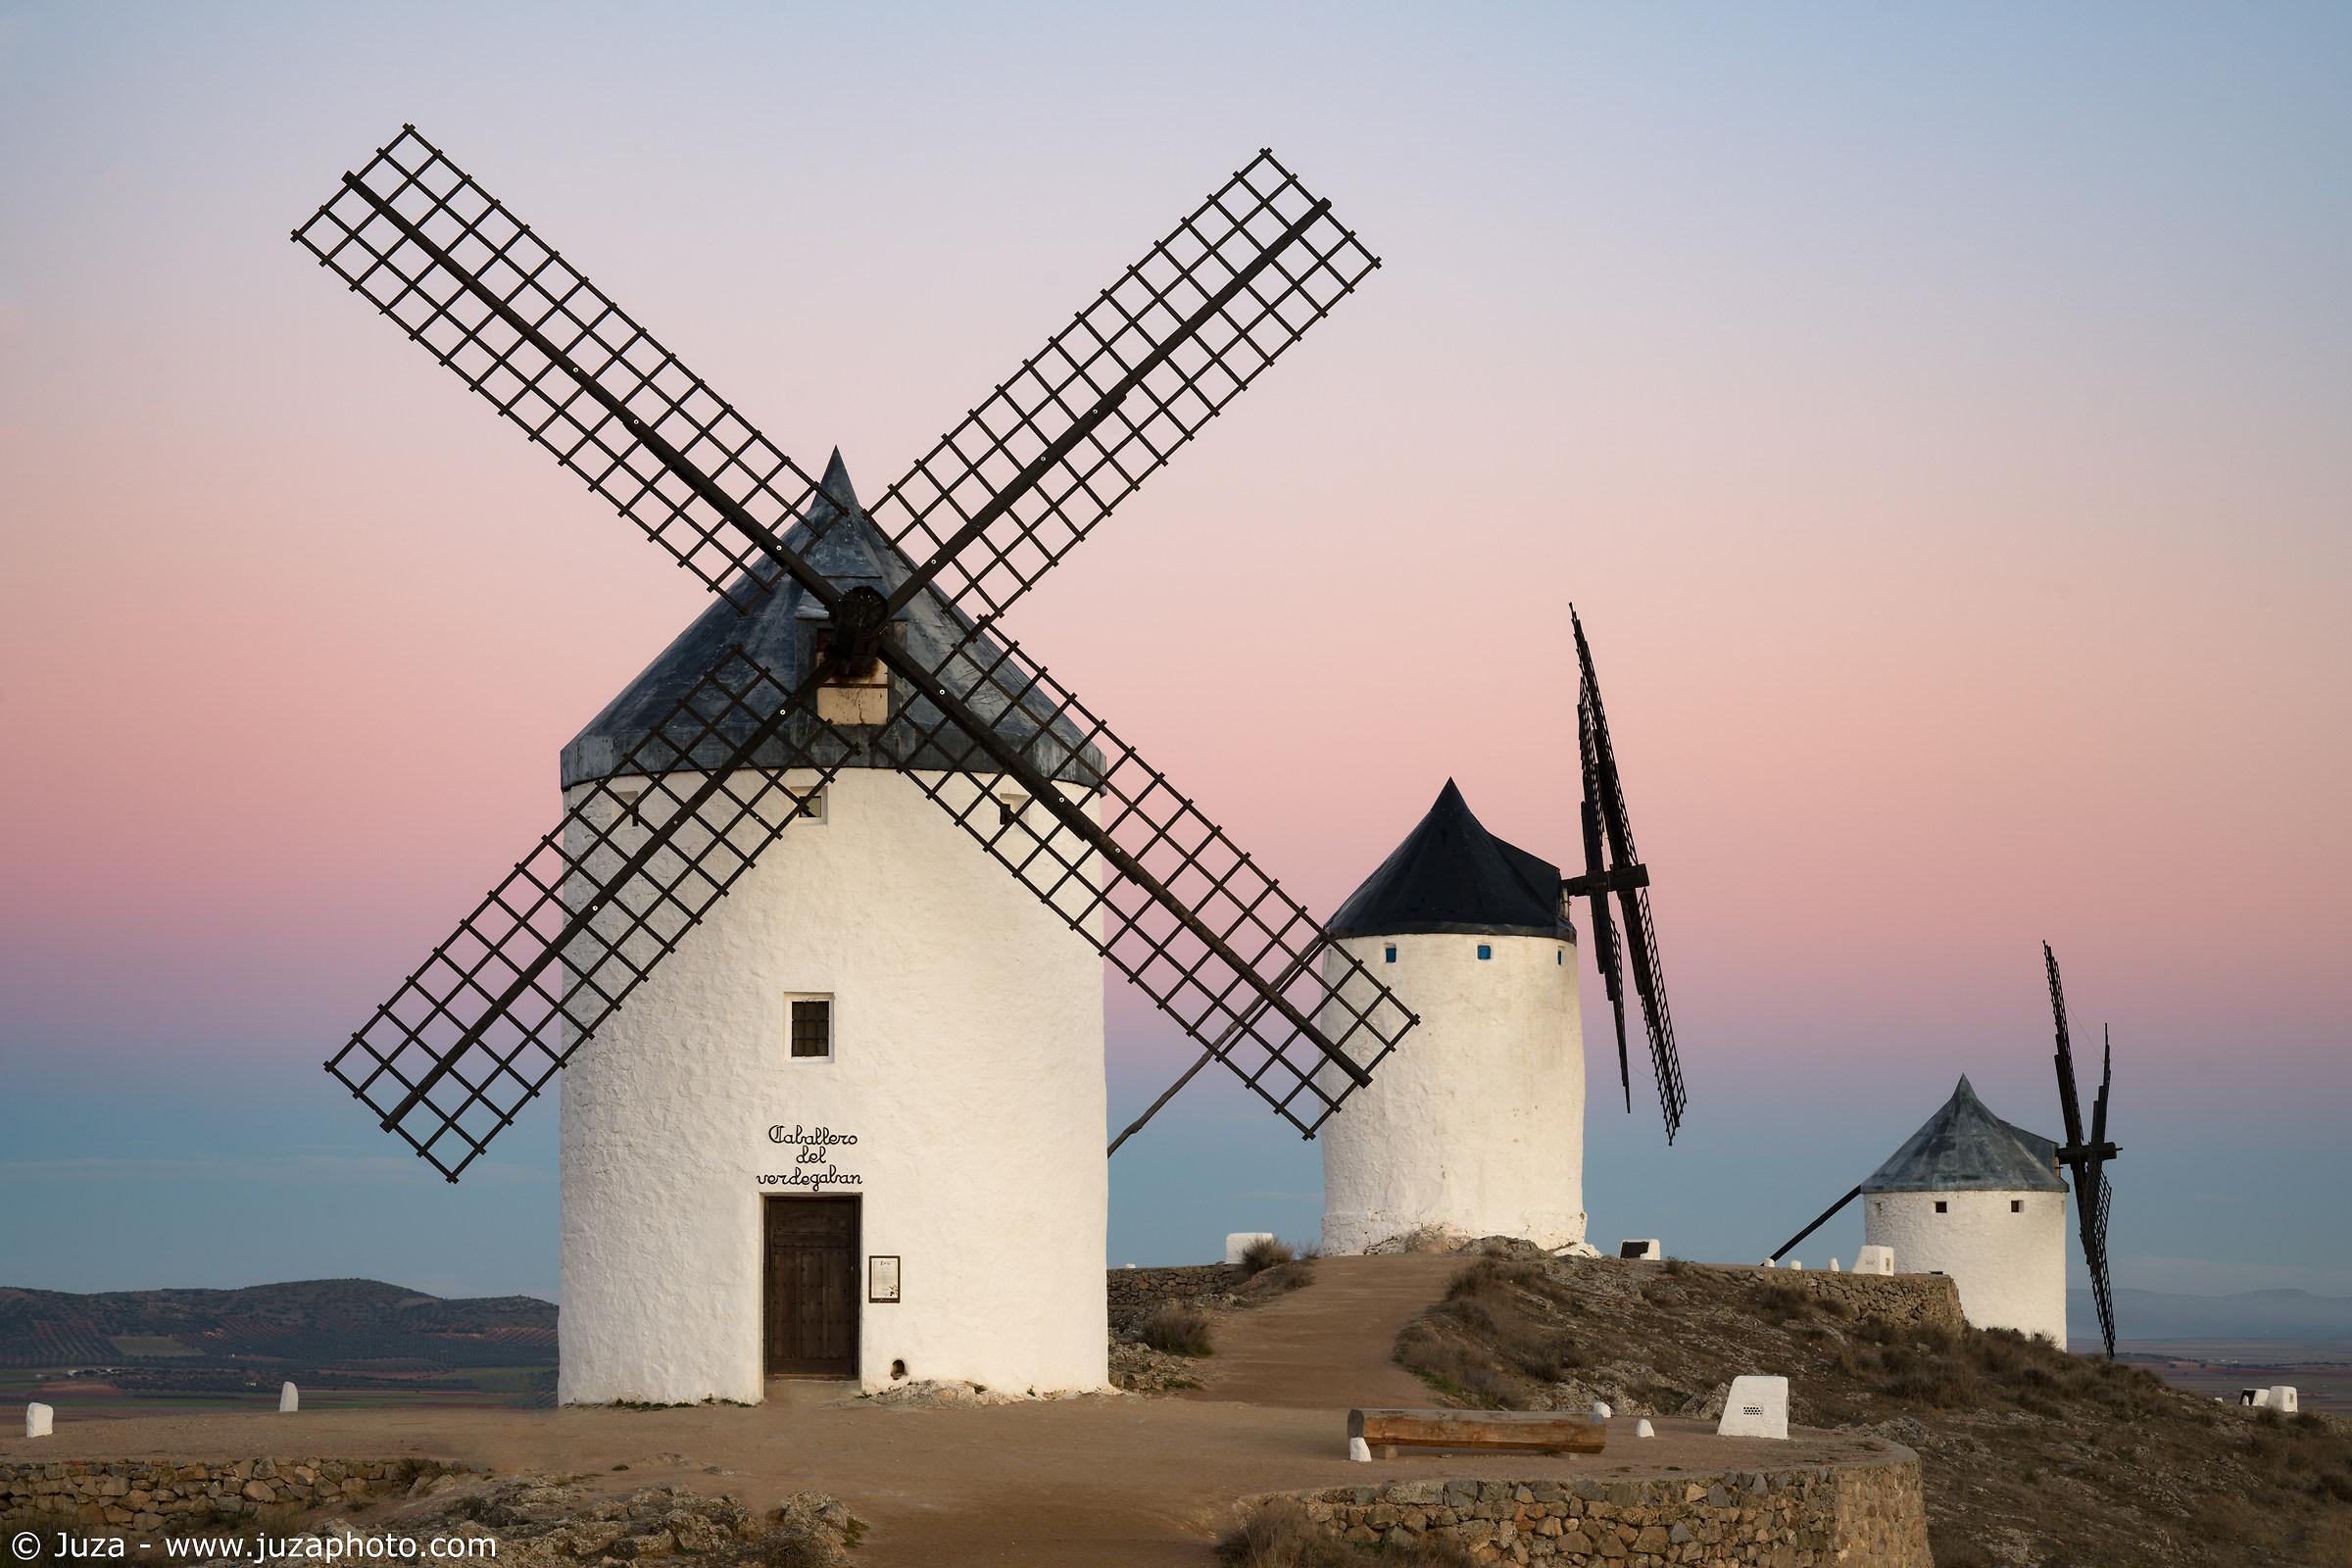 The mills of Don Quixote...